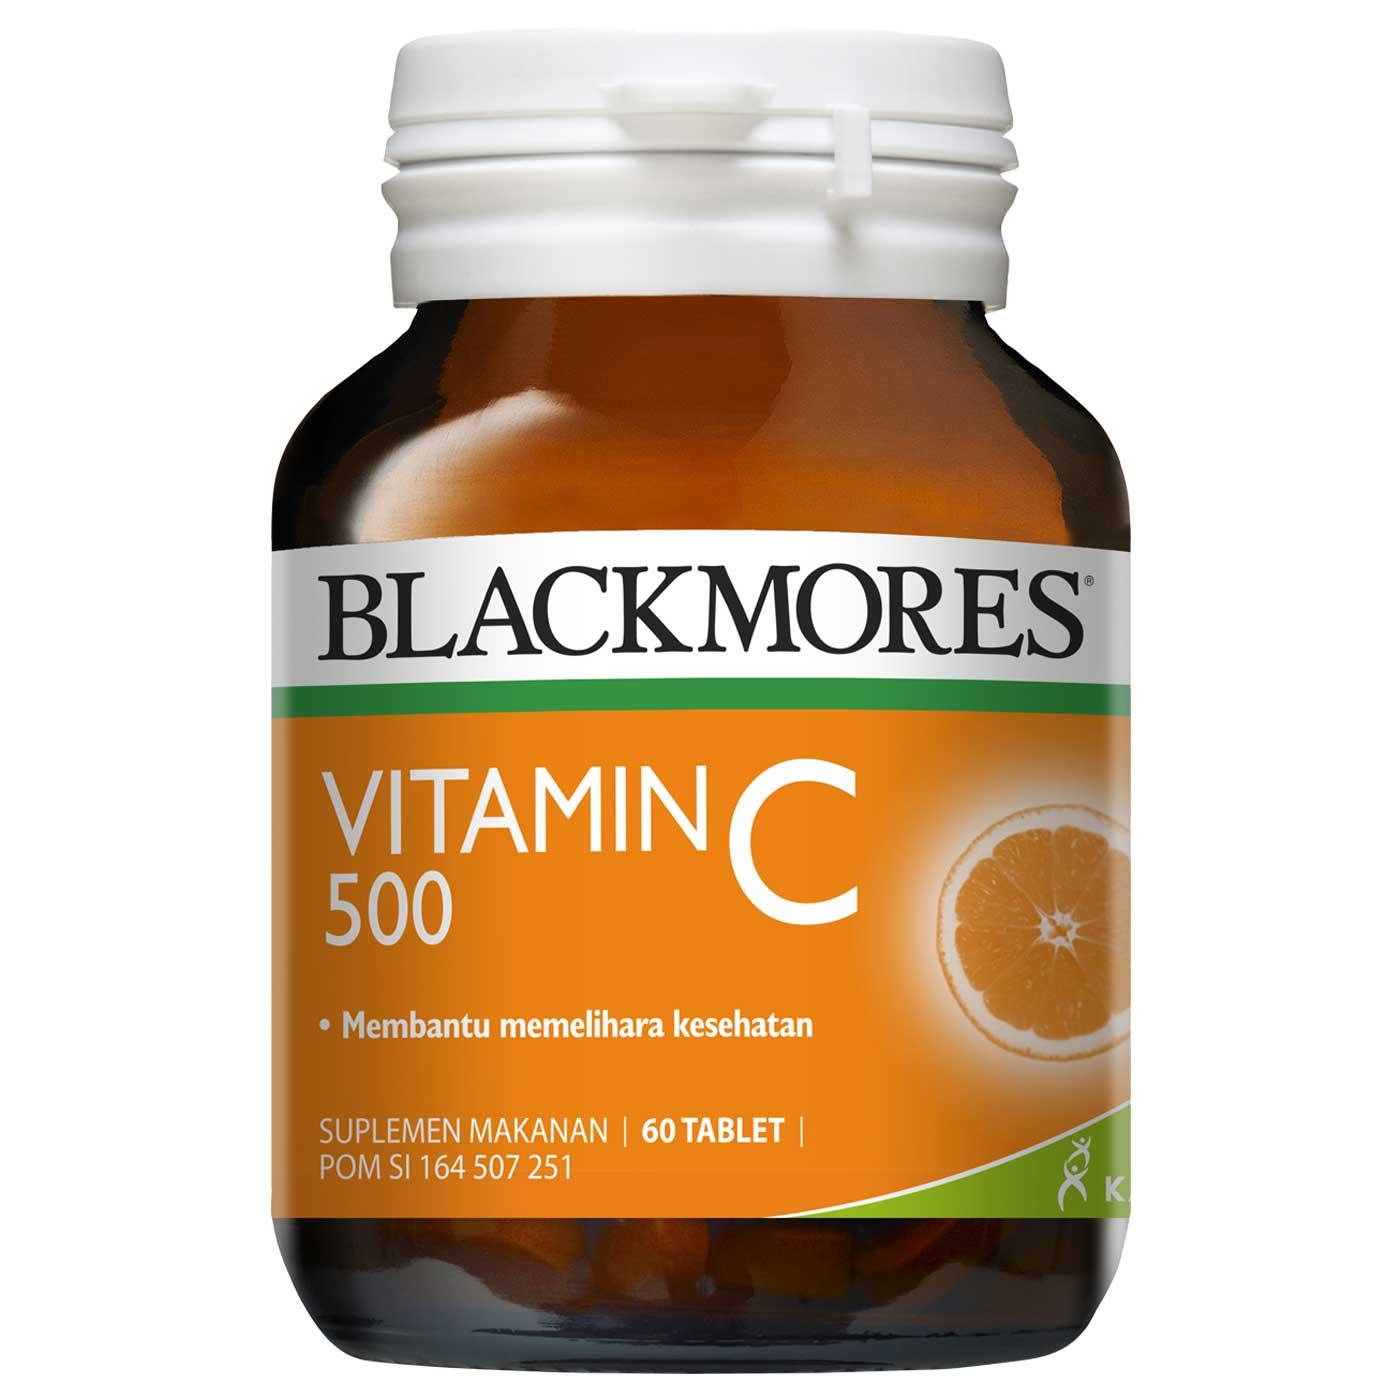 Blackmores Vitamin C 500mg 60 Tablets